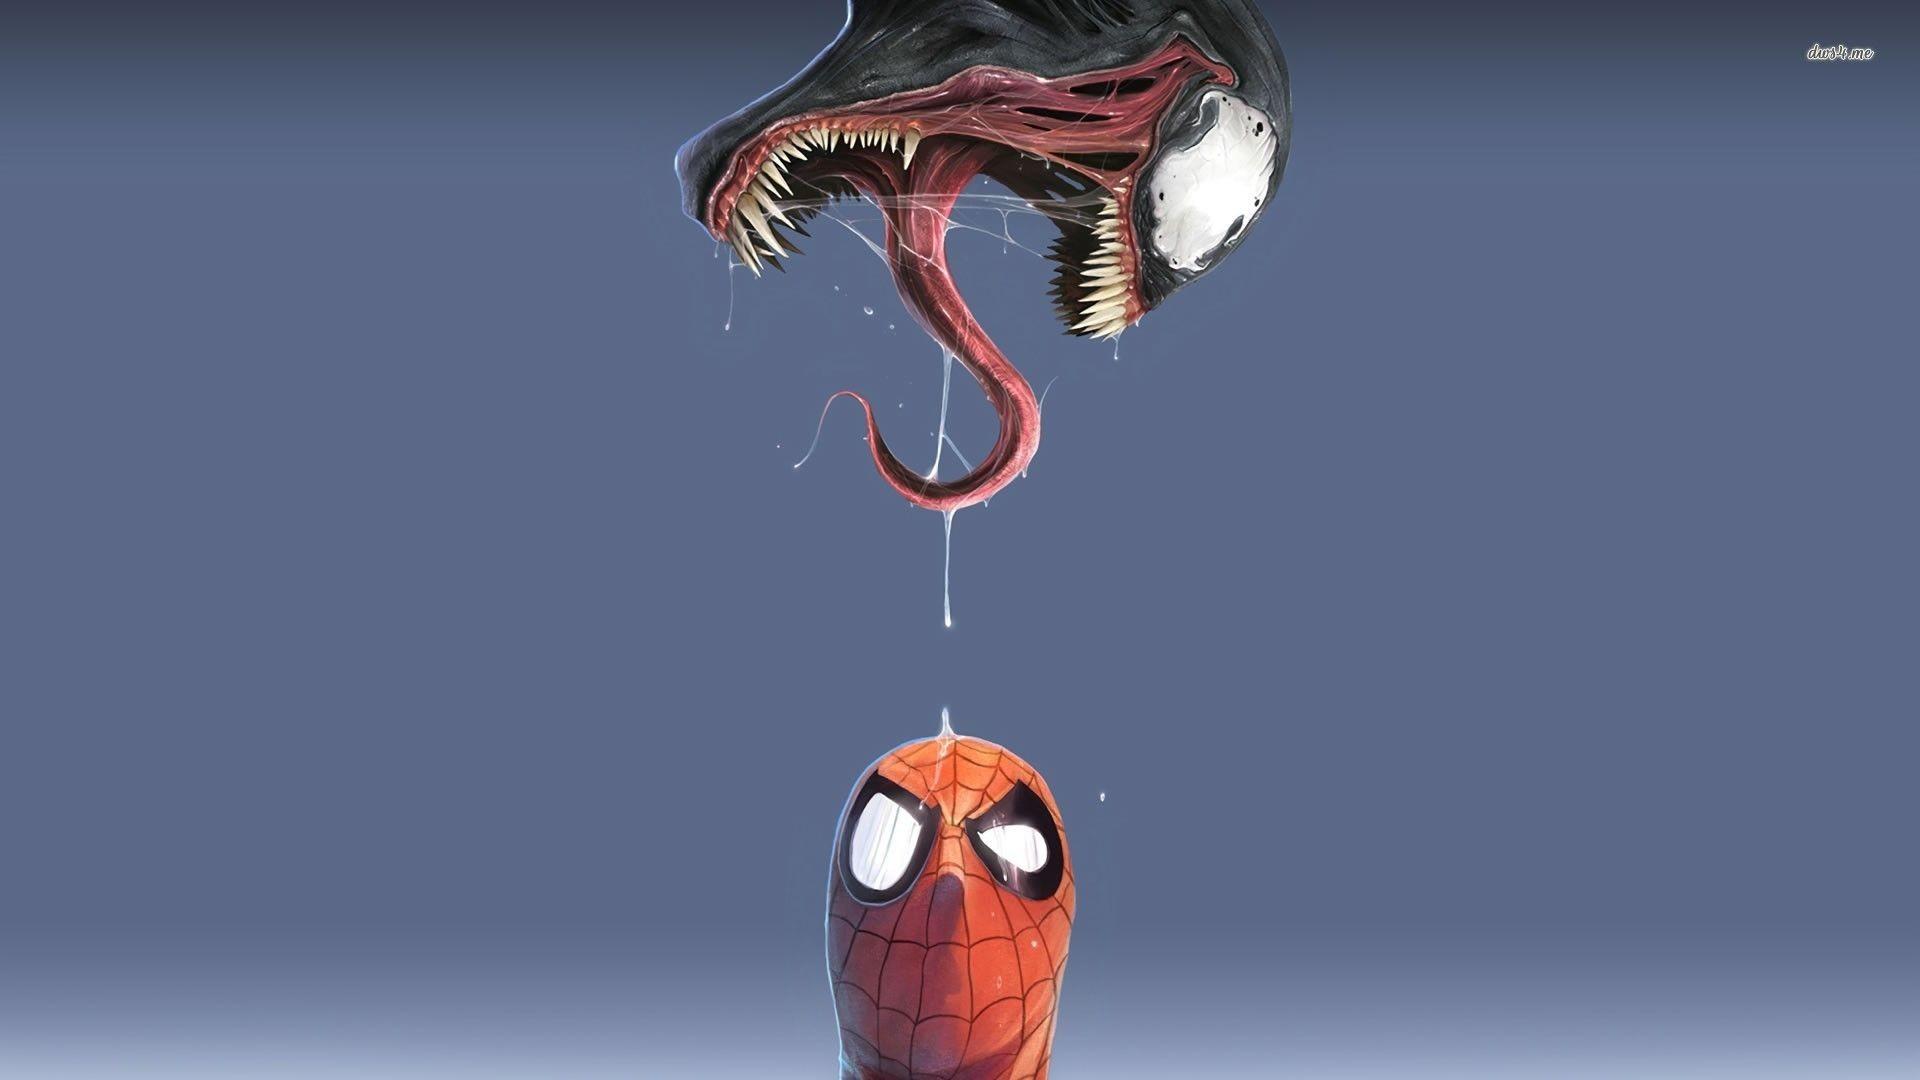 Spiderman Venom Wallpaper Desktop #i0r 1920 x 1080 px 623.08 KB logo venom  black deadpool